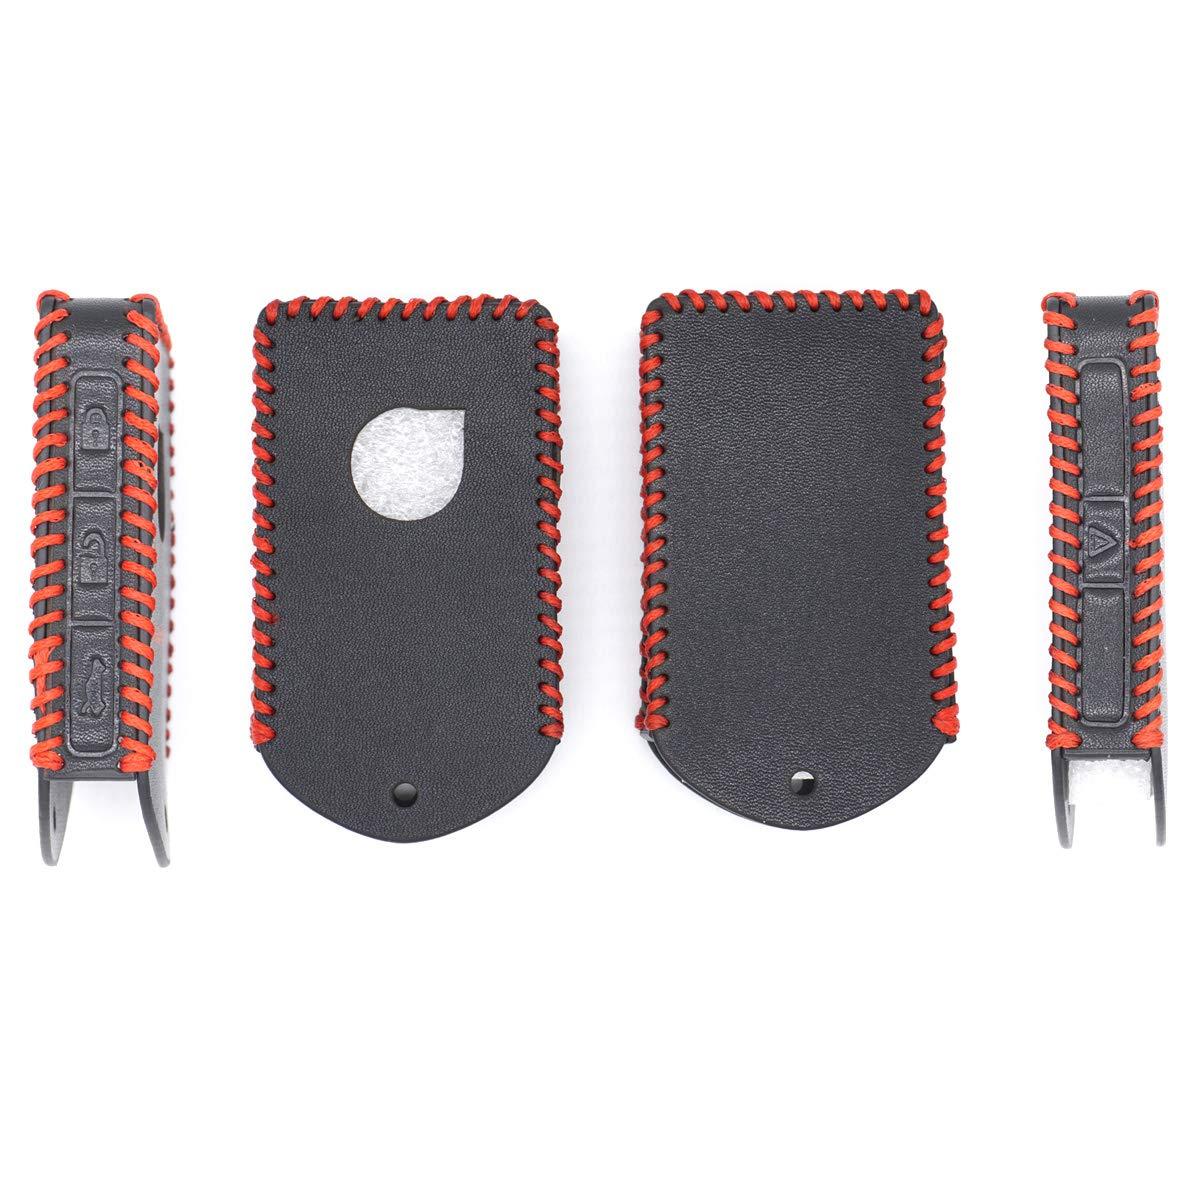 RoyalFox Genuine Leather Smart keyless Entry Remote Key Fob case Cover Keychain for 2016 2017 2018 2019 2020 Volvo XC60 XC90 S90 V90 XC40 Side Button fob